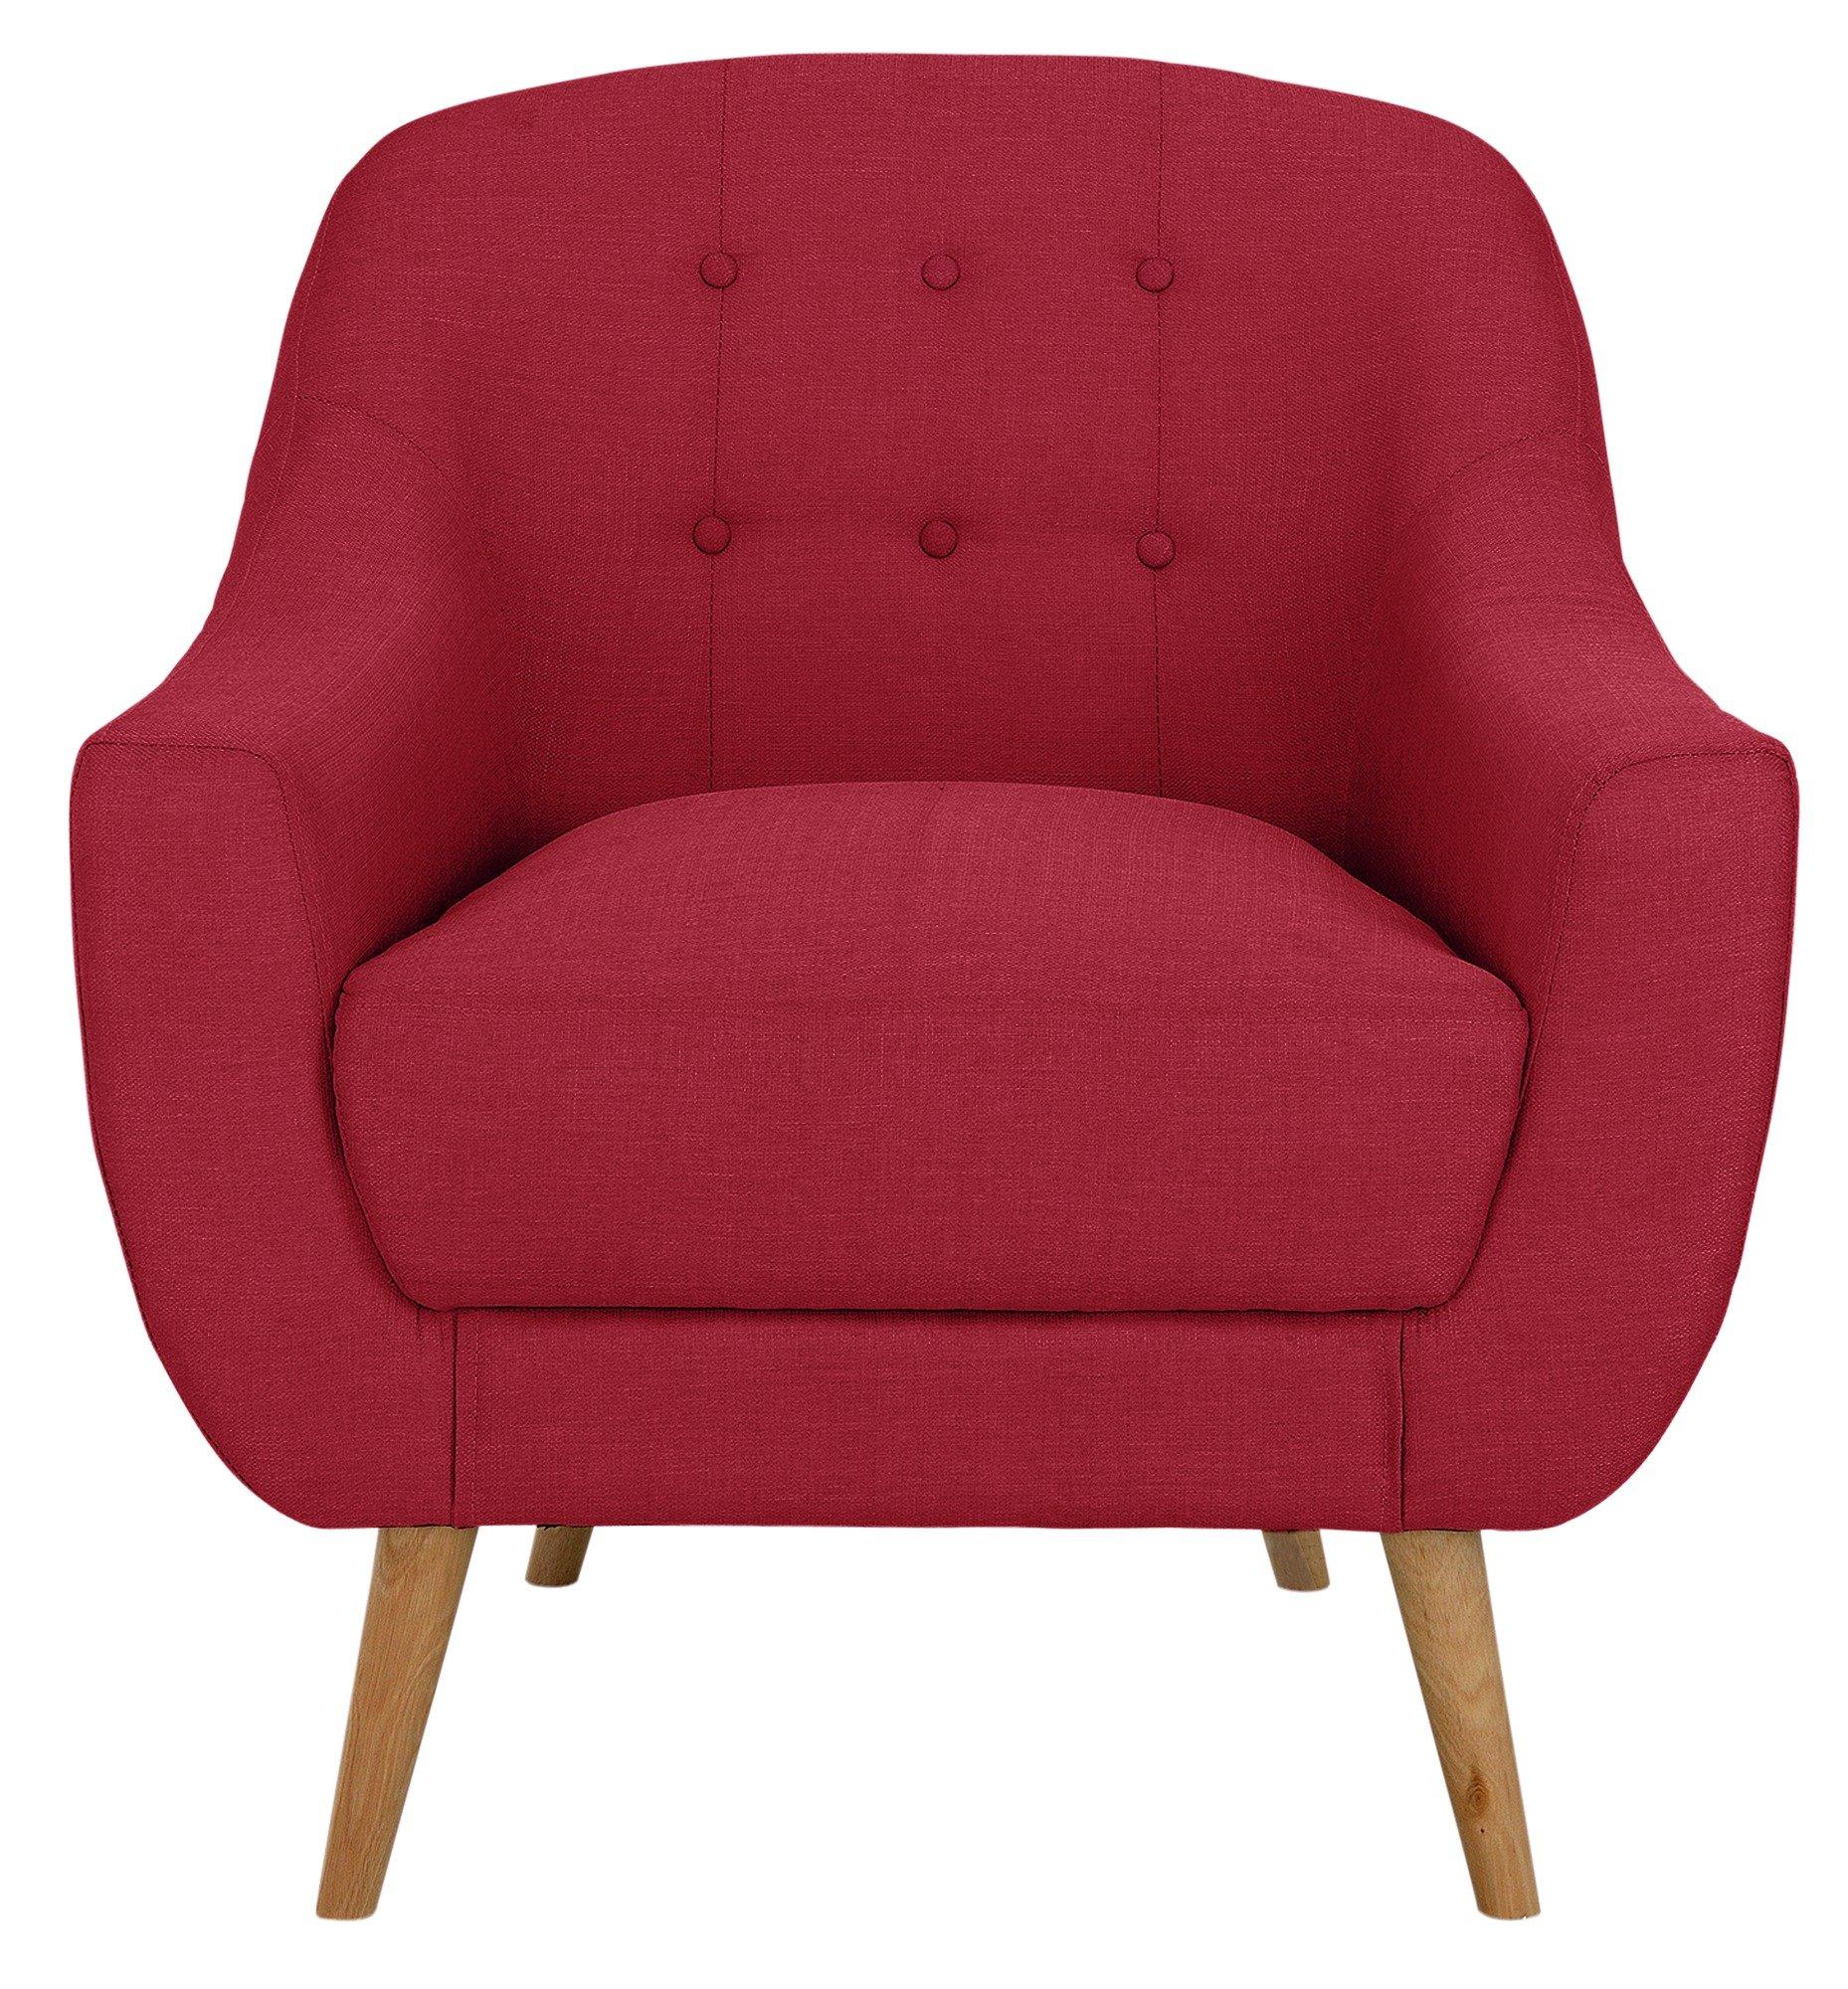 chair stool argos yellow metal chairs